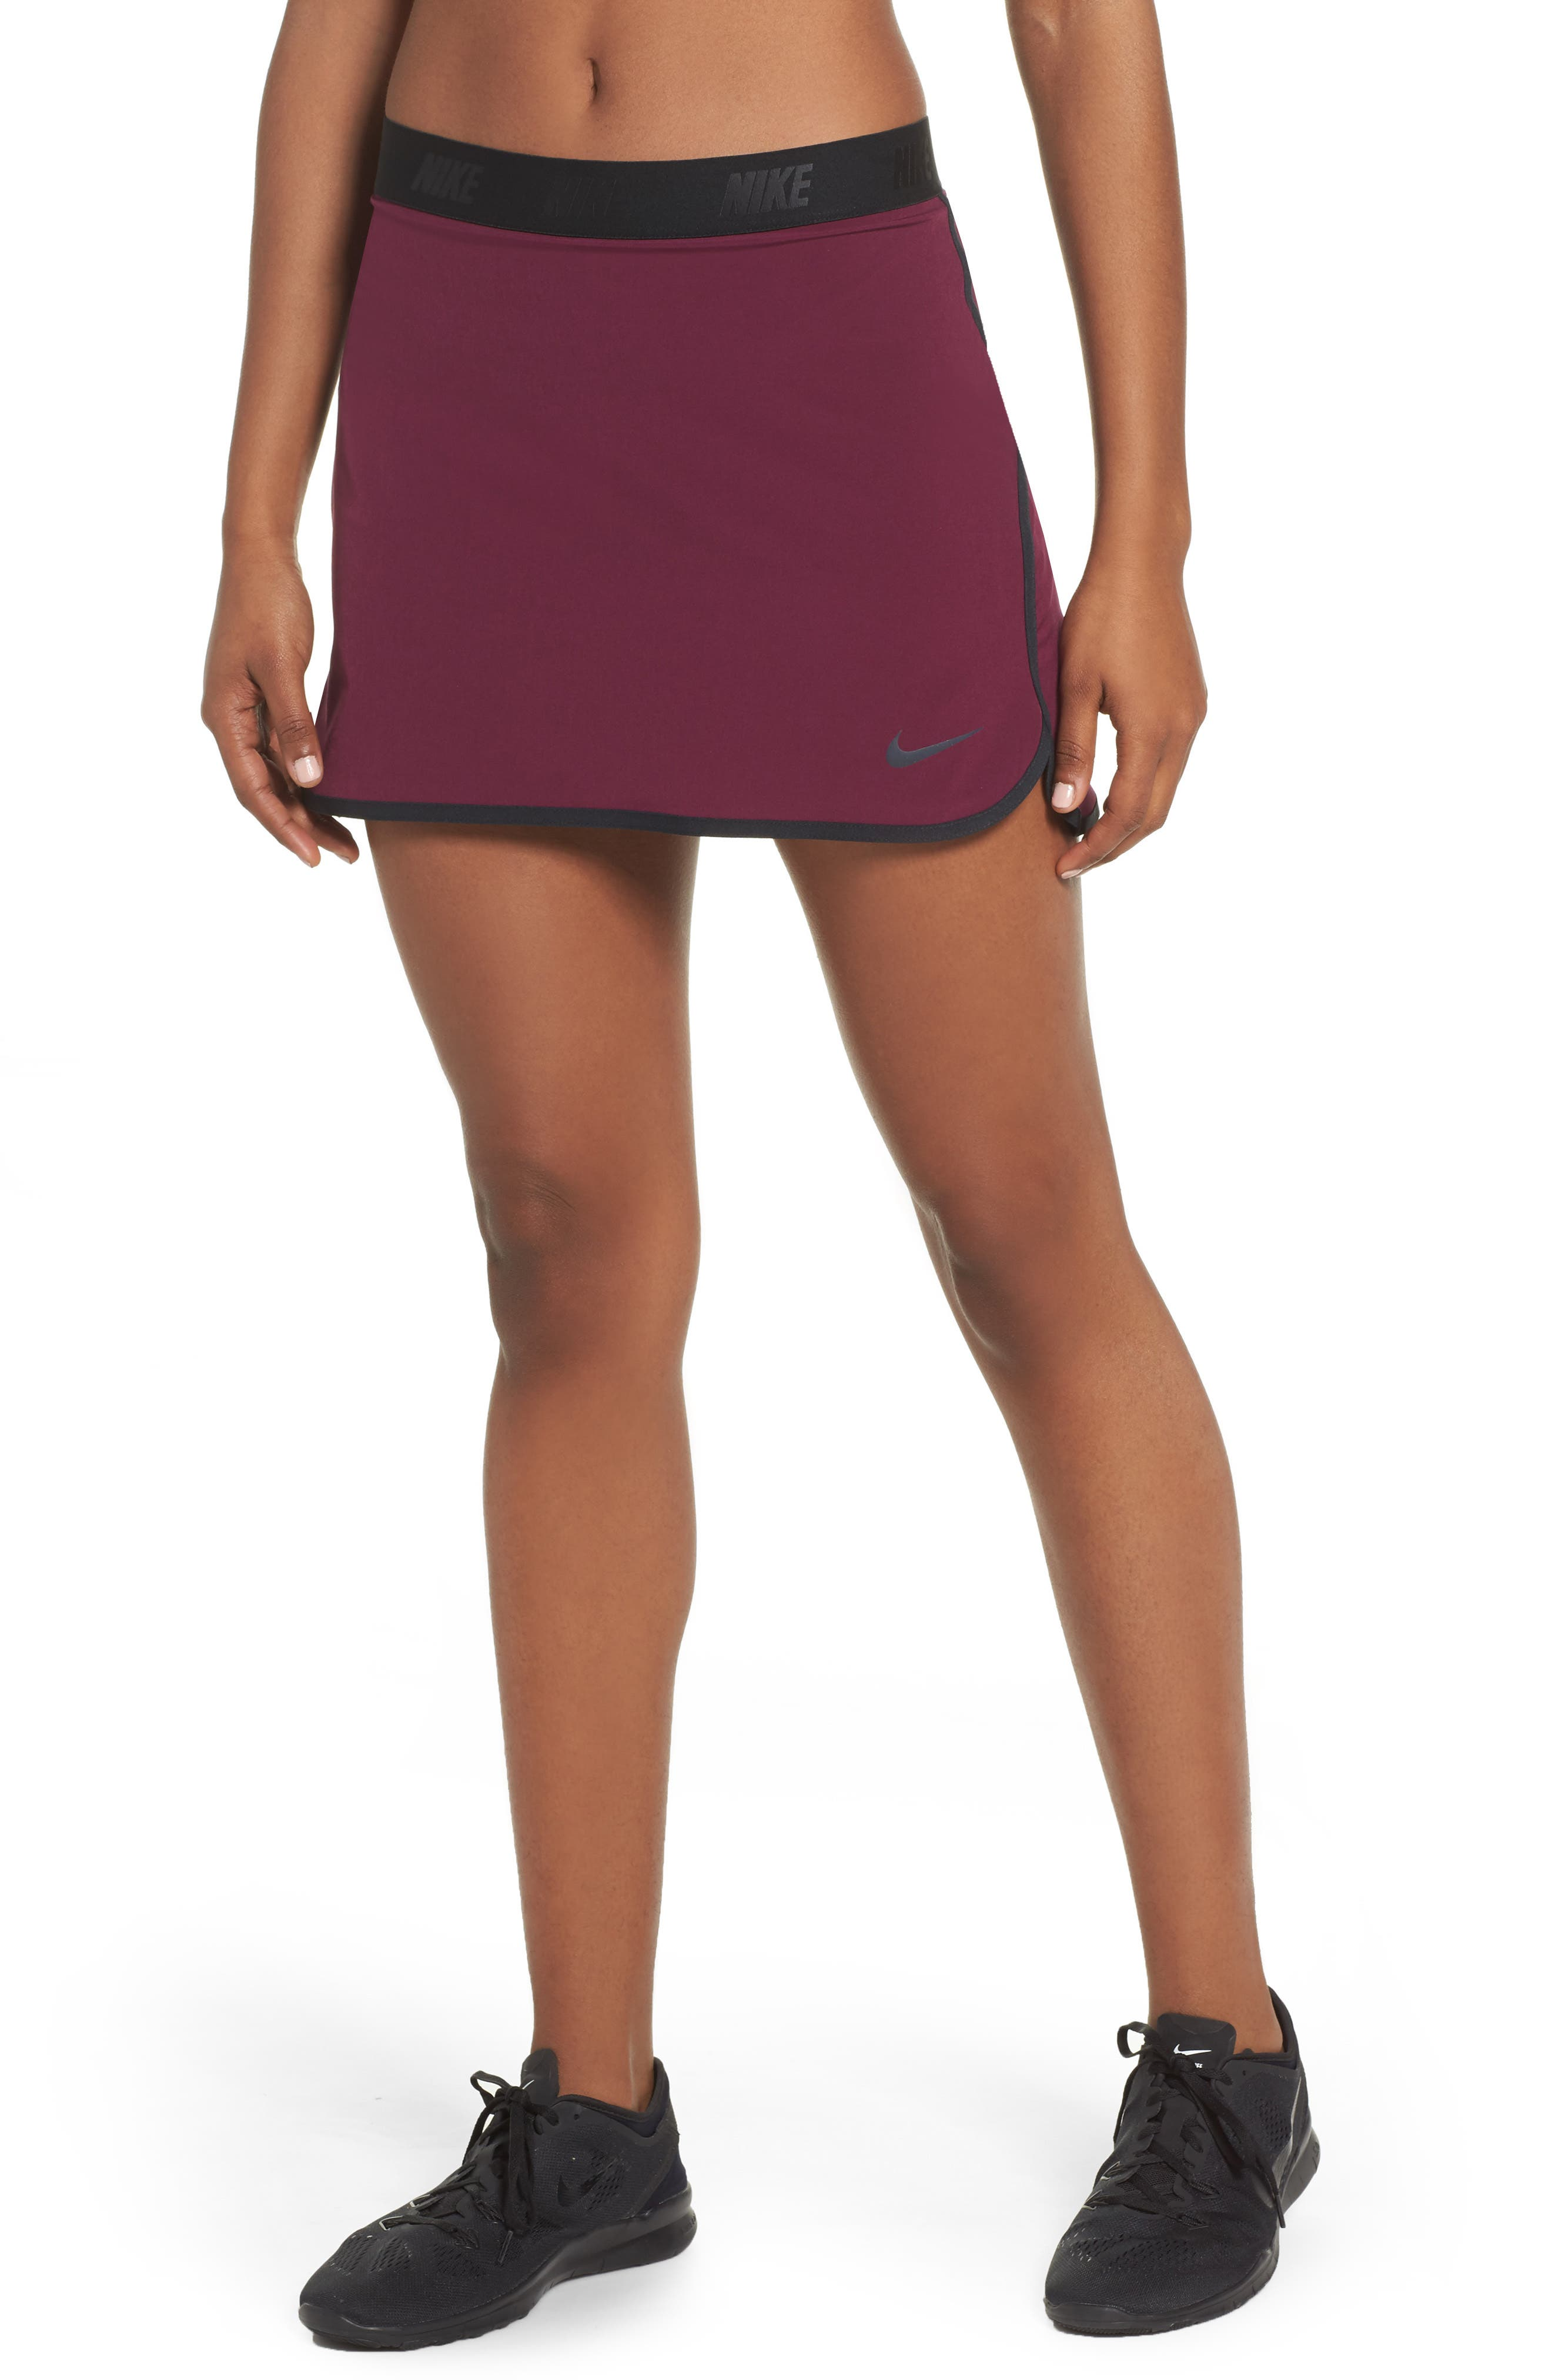 Flex Tennis Skirt,                             Main thumbnail 1, color,                             Burgundy